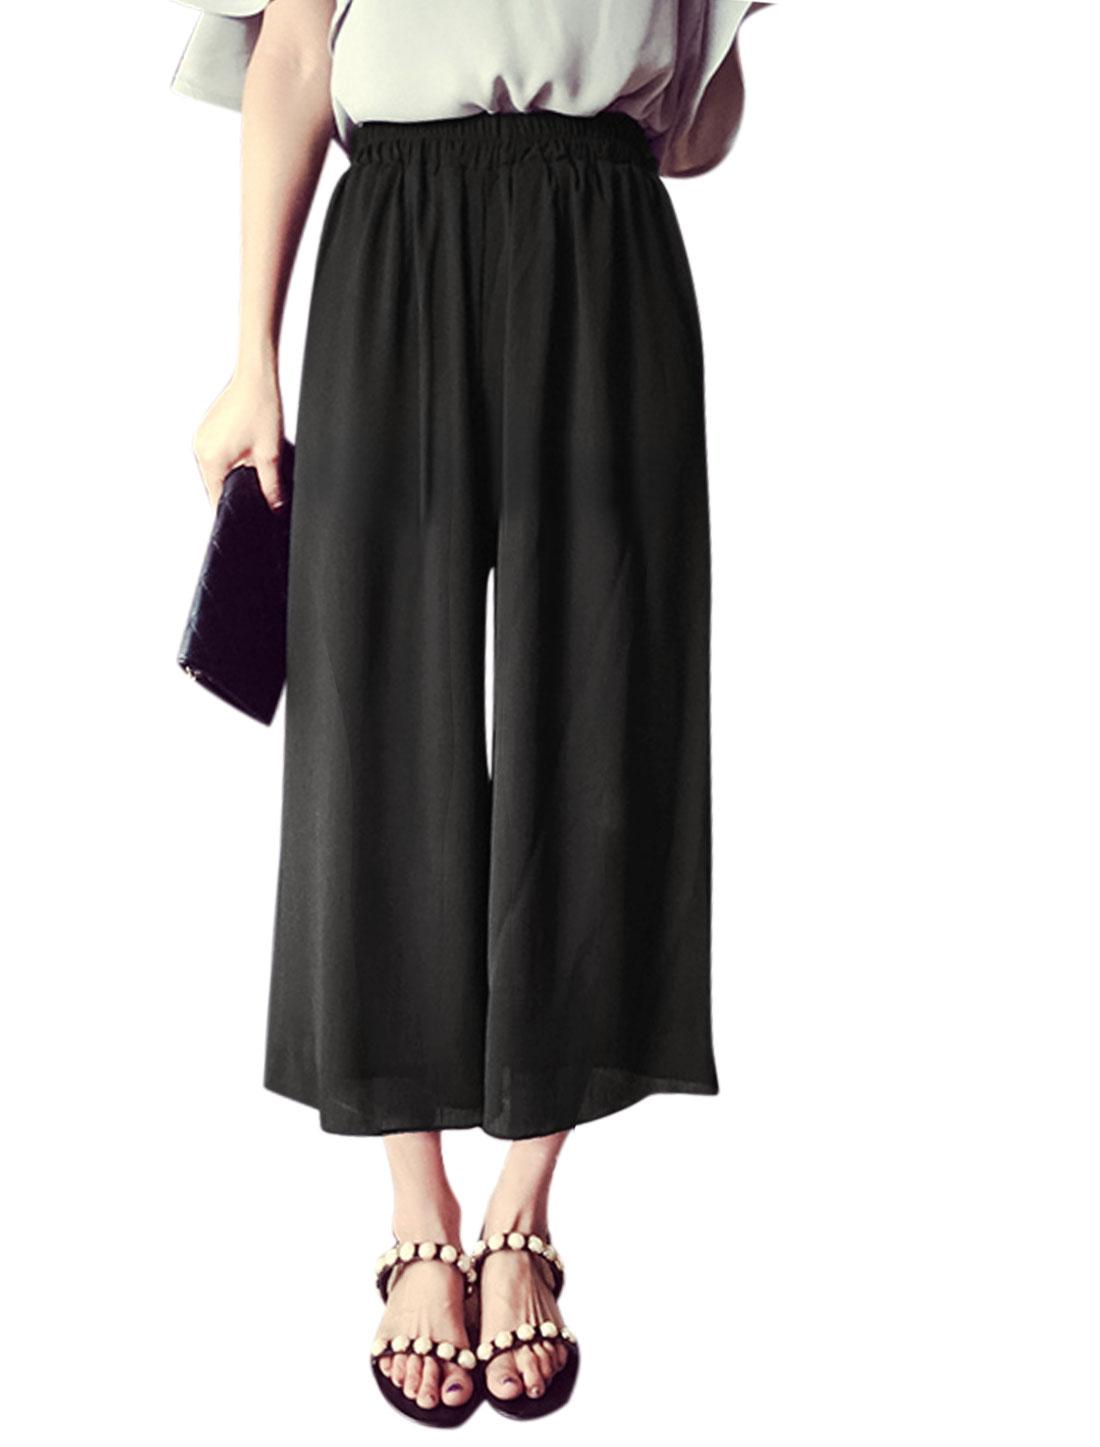 Ladies Mid Rise Elastic Waist Fully Lined Wide Leg Casual Capris Pants Black XS